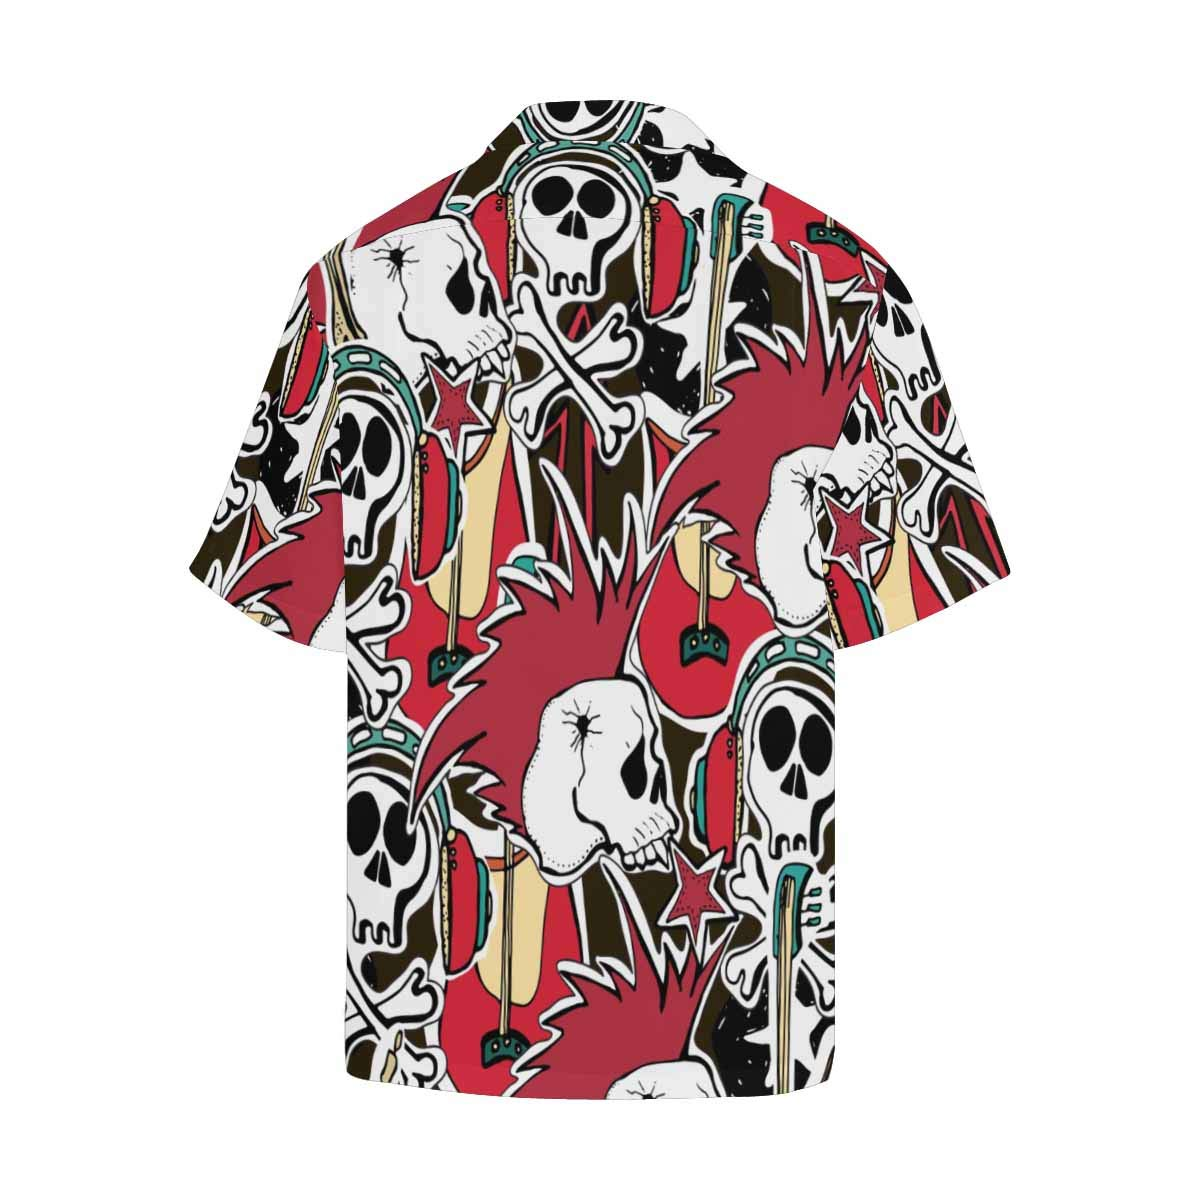 InterestPrint Mens Shirt Black Bicycle T-Shirts Short Sleeve Tops for Men